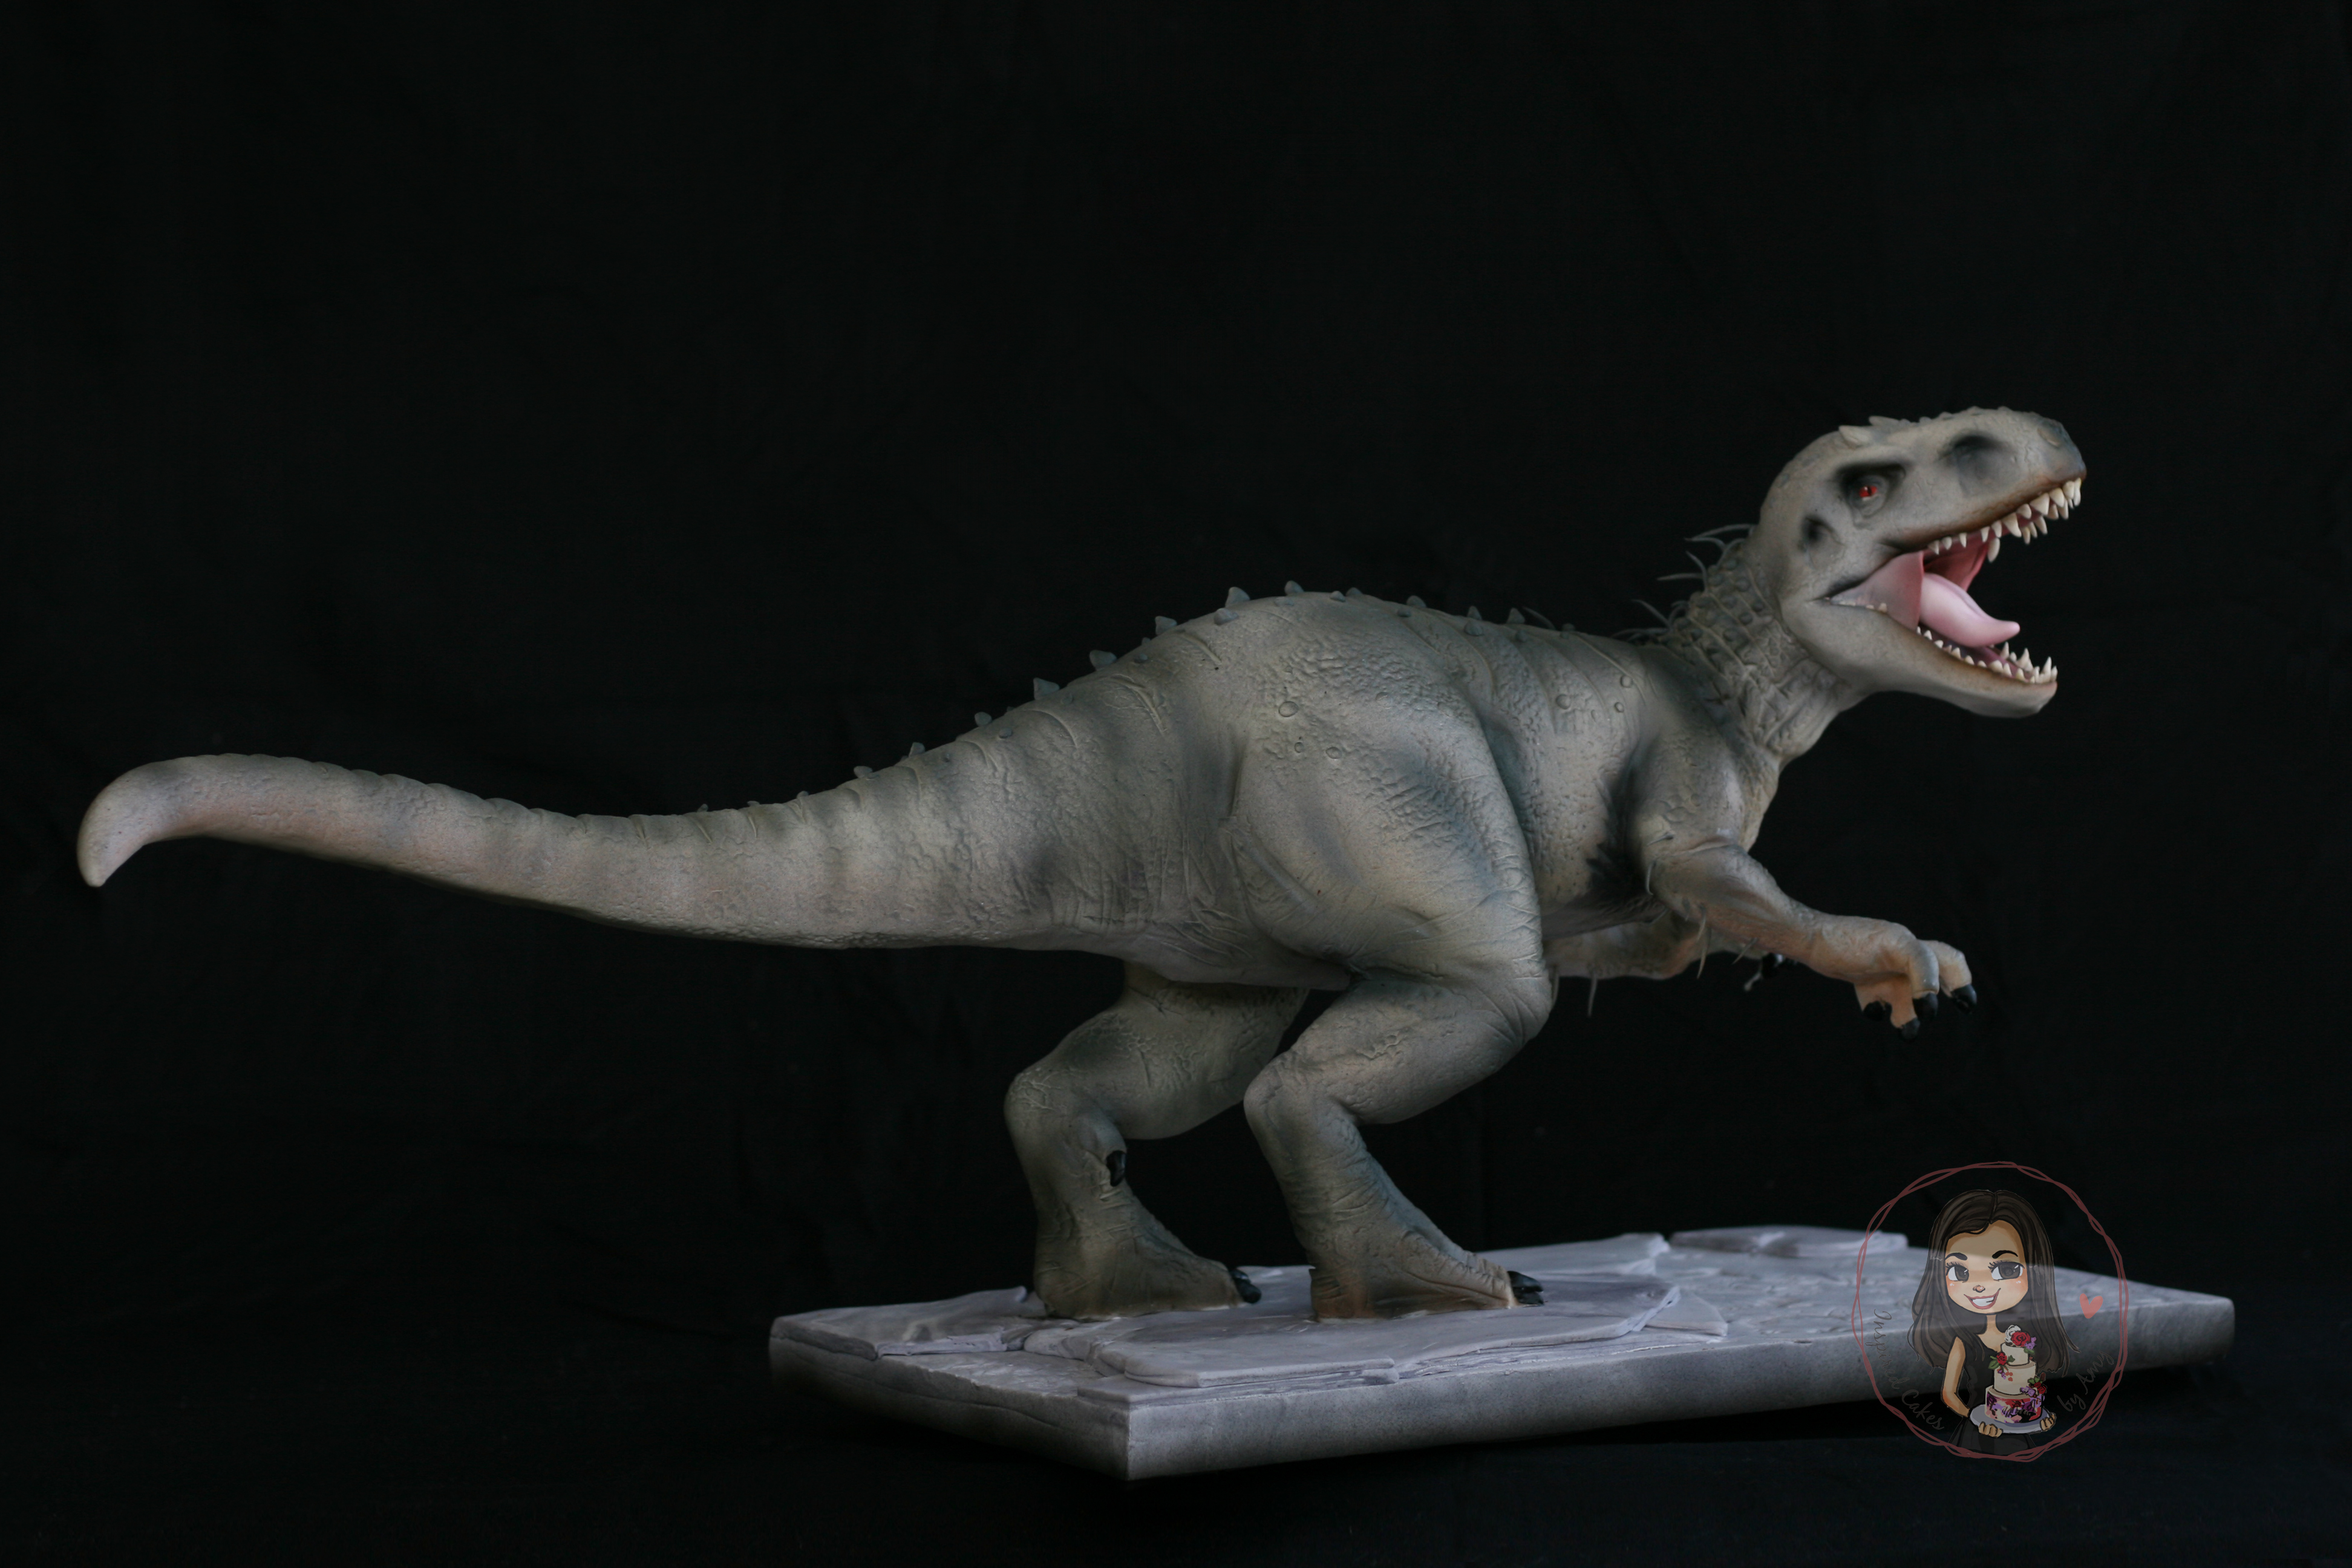 Indominus Rex 3d gravity defying cake